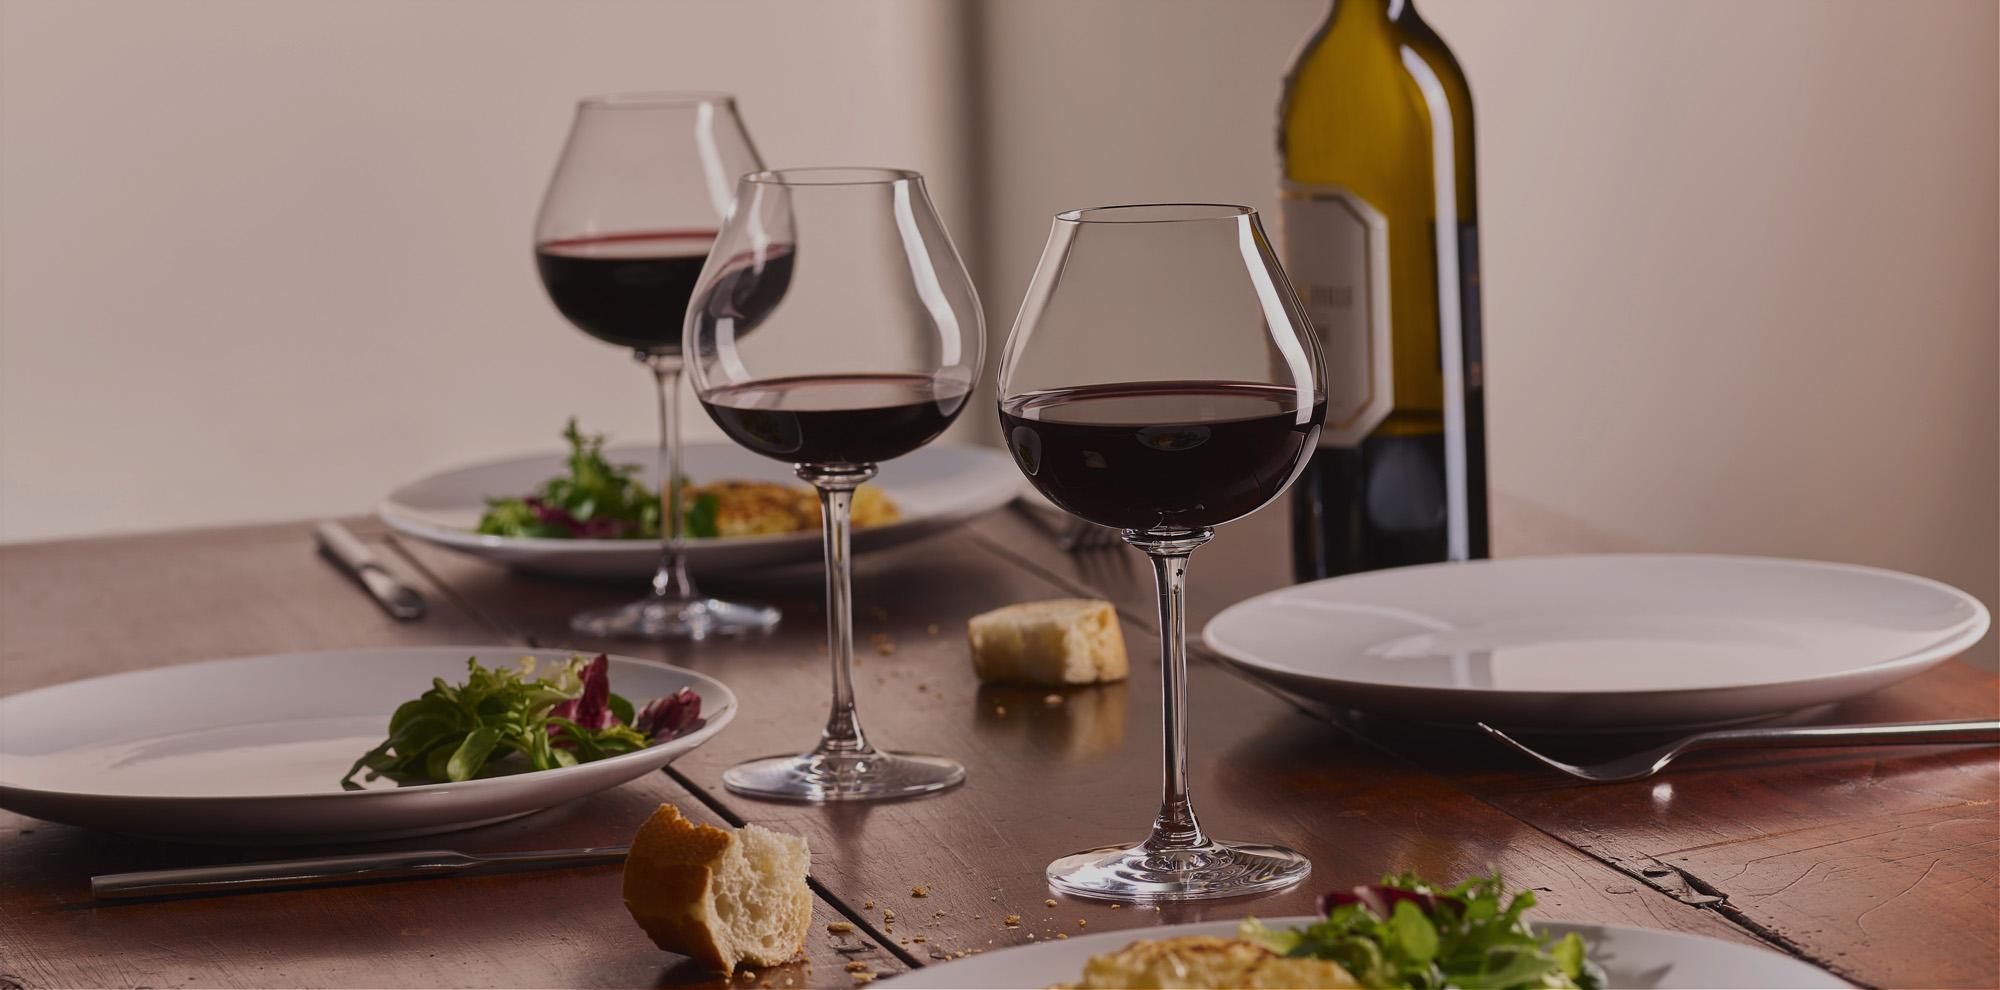 saveurs de vin peugeot saveurs. Black Bedroom Furniture Sets. Home Design Ideas